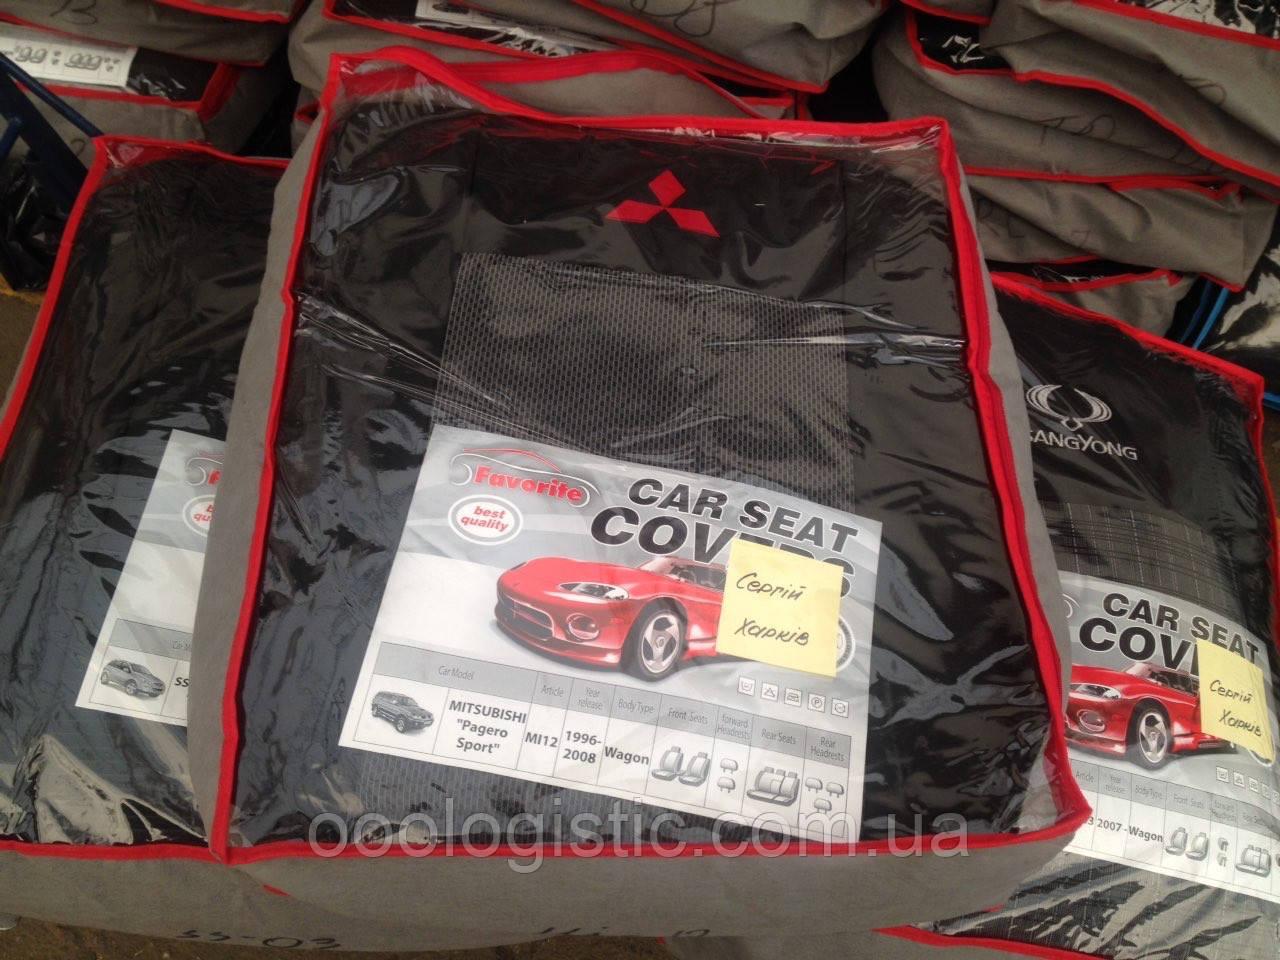 Авточехлы Favorite на Mitsubishi Pajero Sport 1996-2008 ,Мицубиси Паджеро спорт модельный комплект